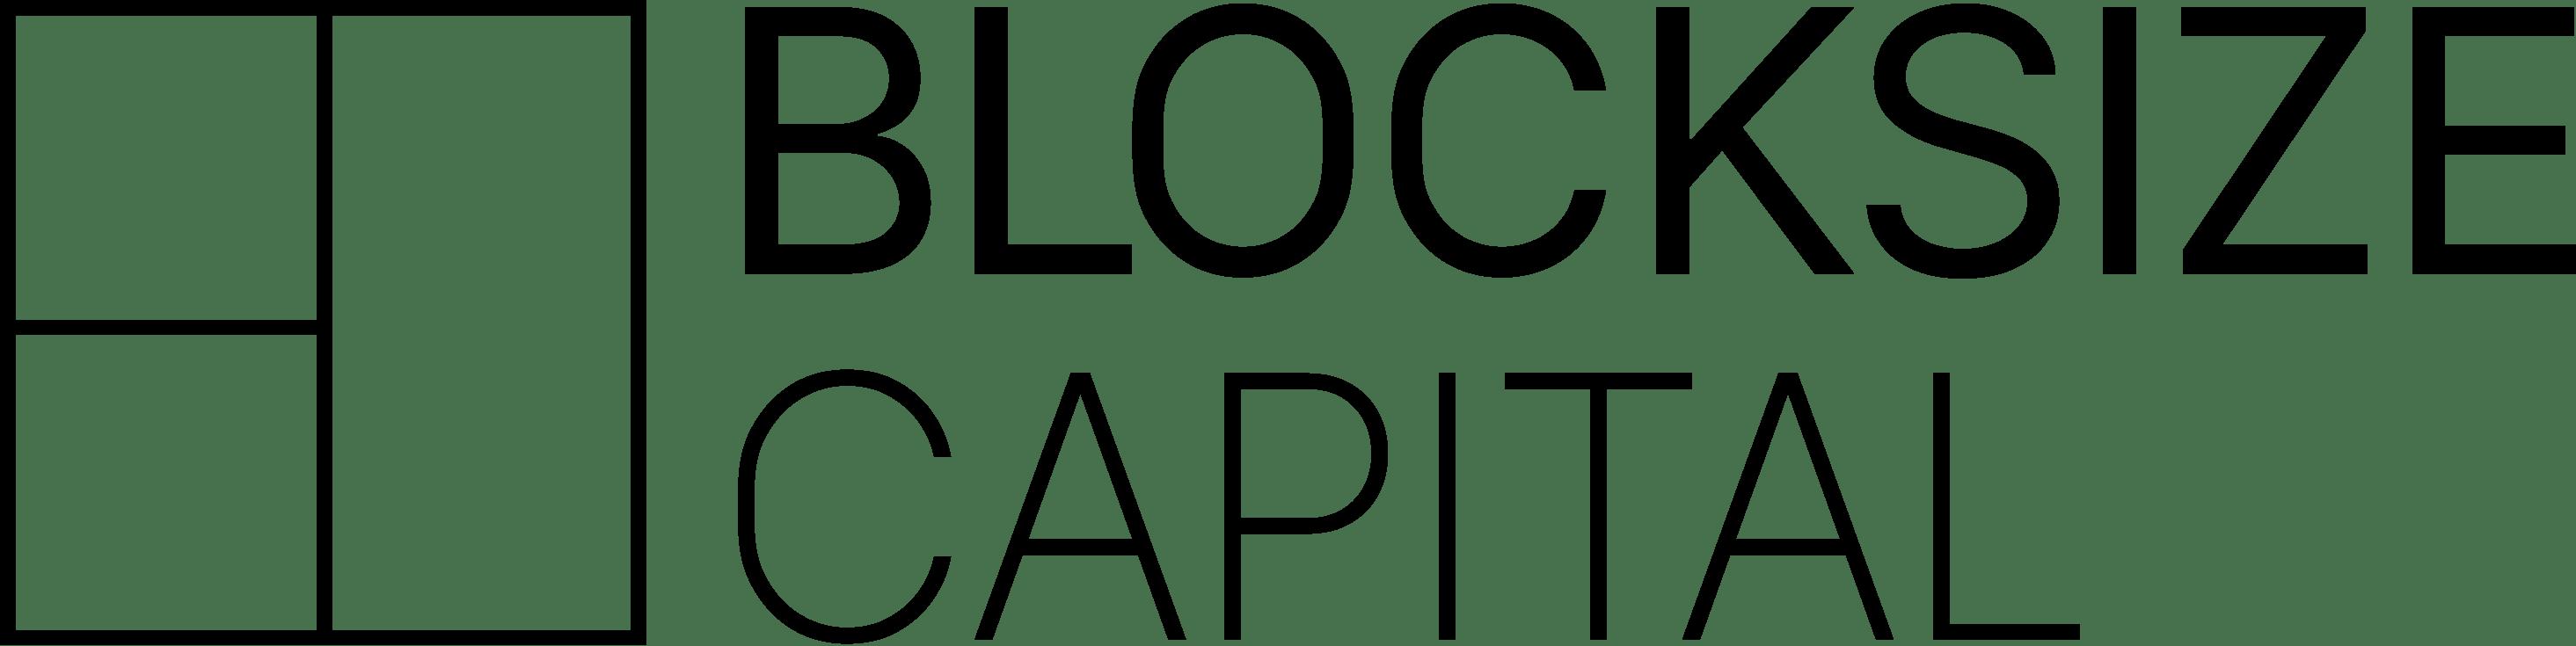 Blocksize Capital